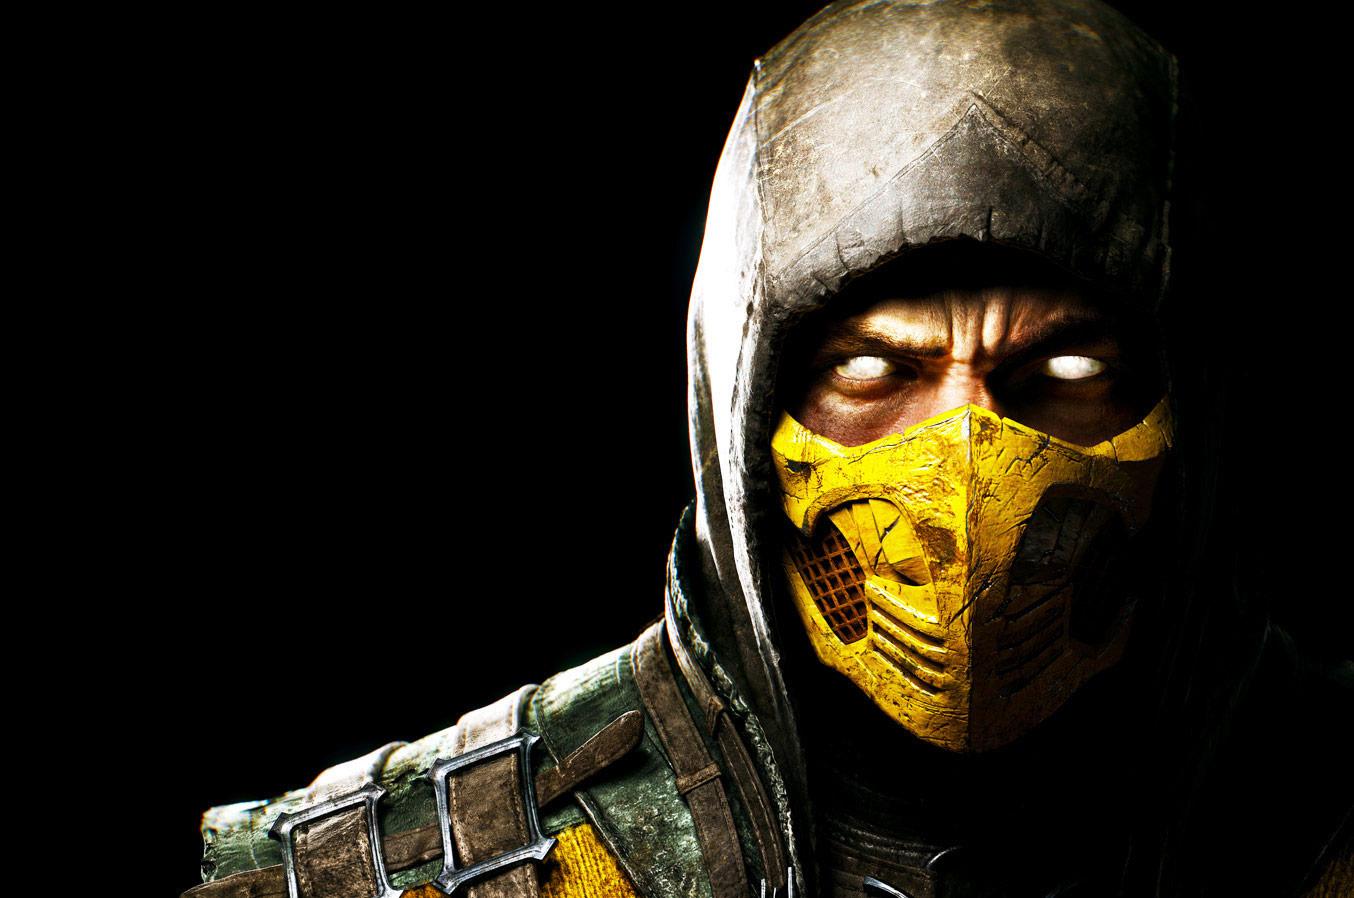 Image of Scorpion in Mortal Kombat 10 #2